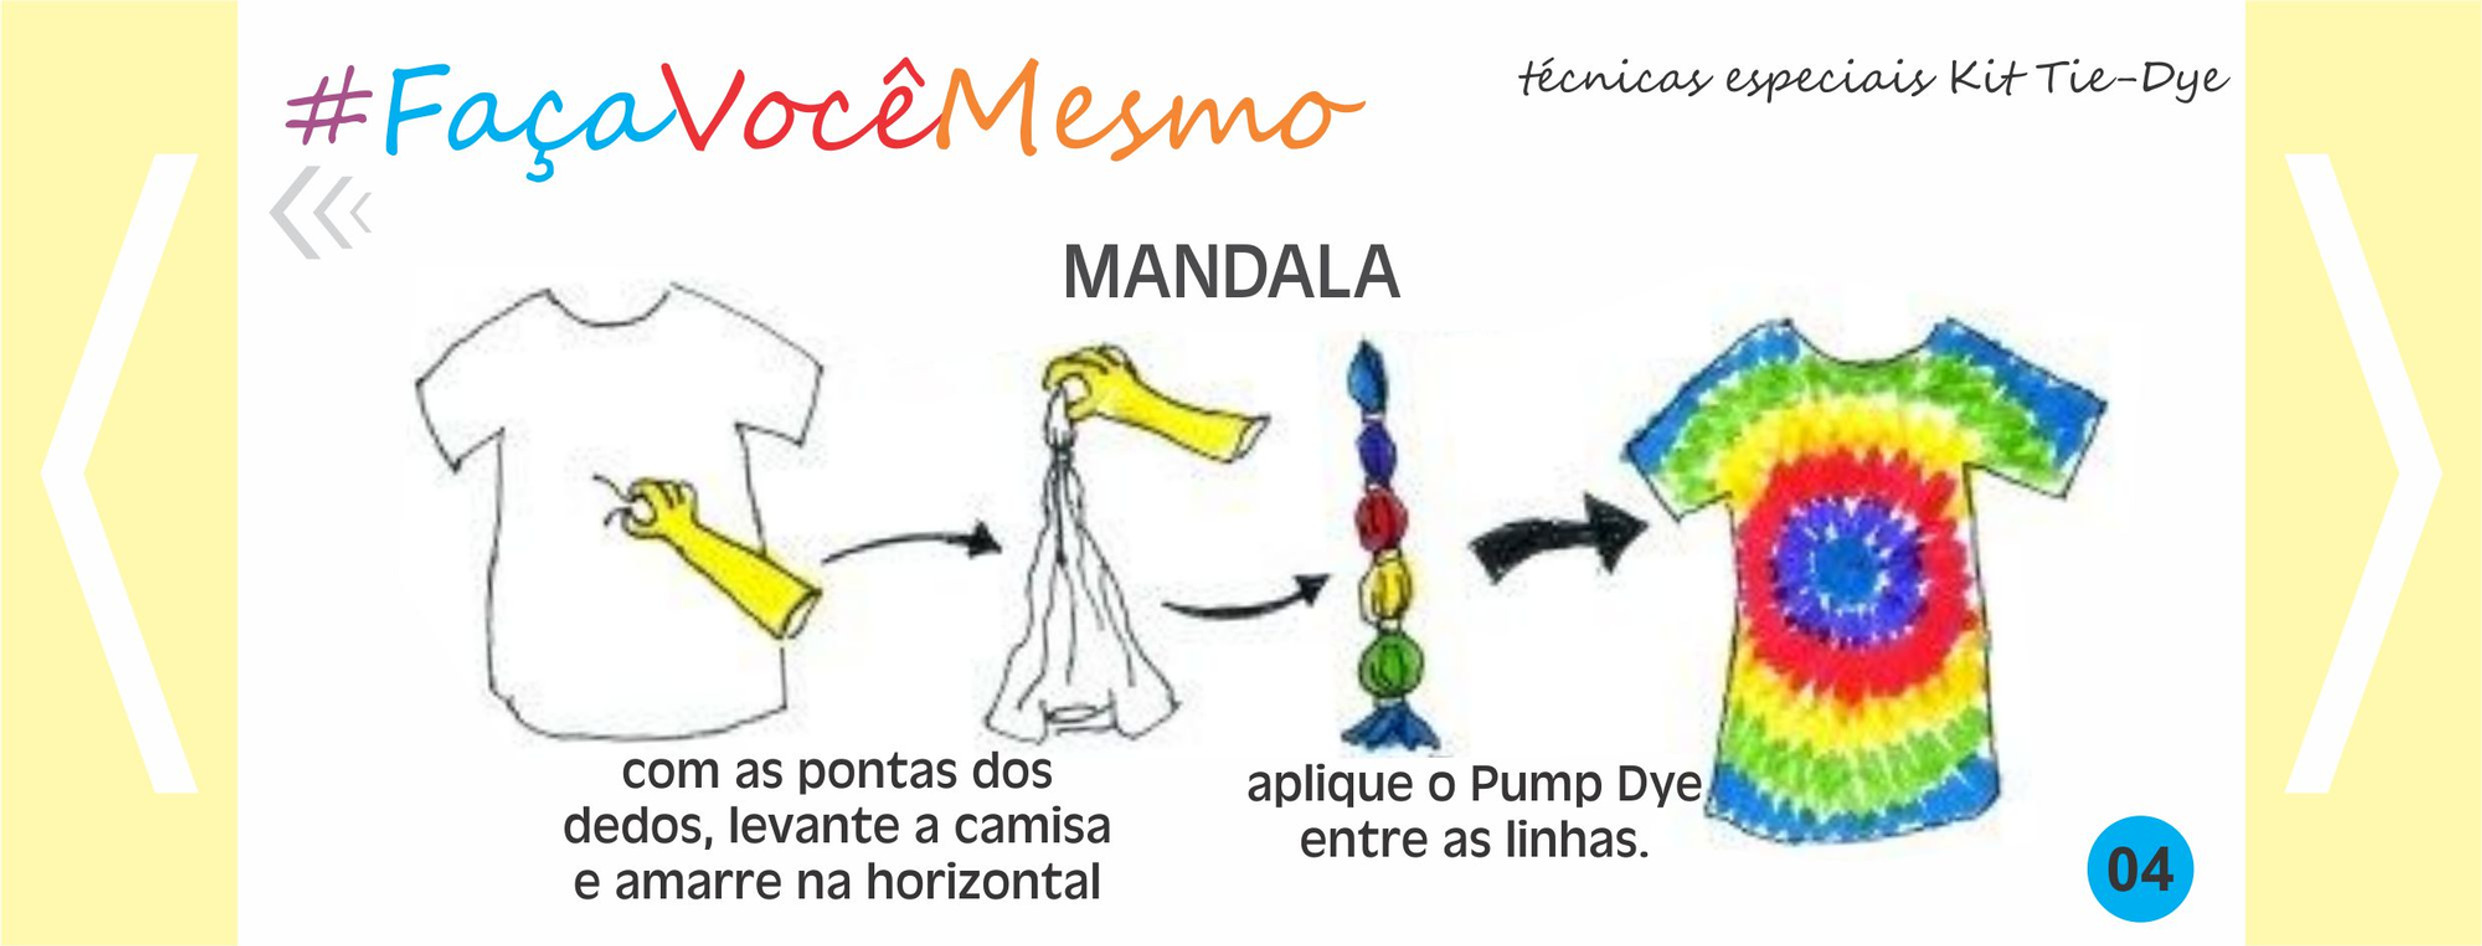 banner kit tie-dye pump dye 04.jpg